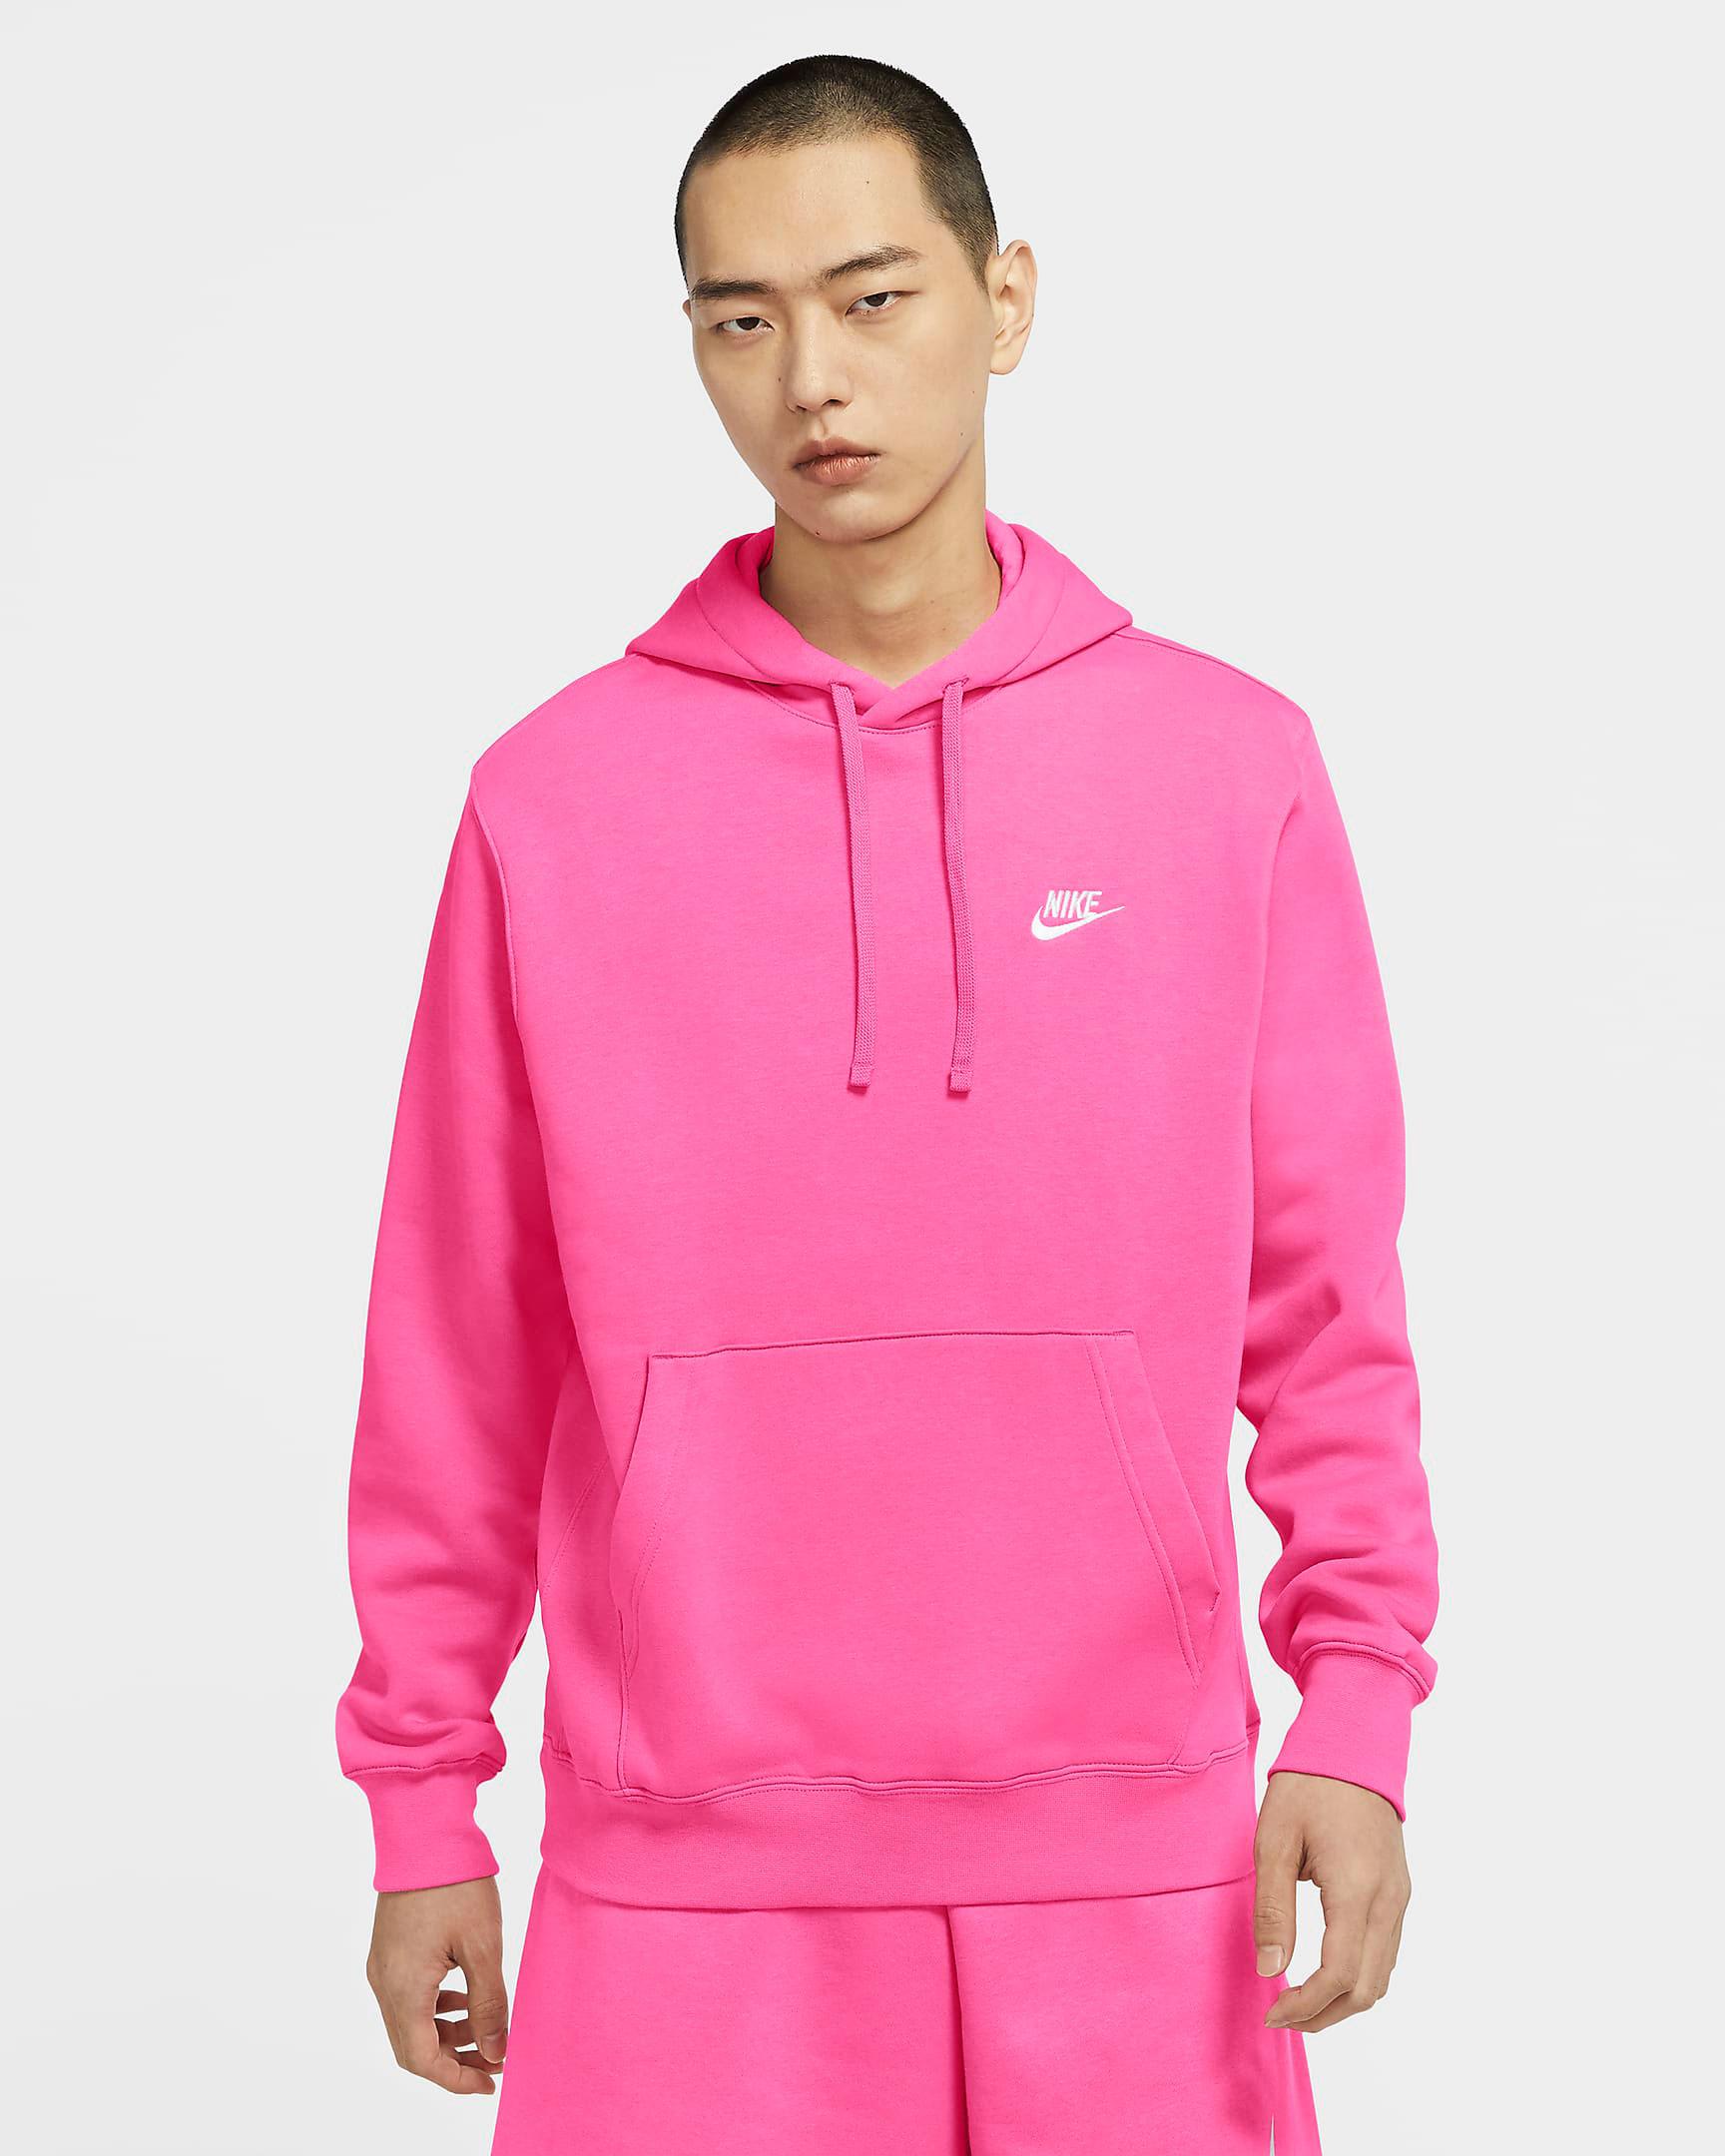 air-jordan-1-bio-hack-pink-hoodie-match